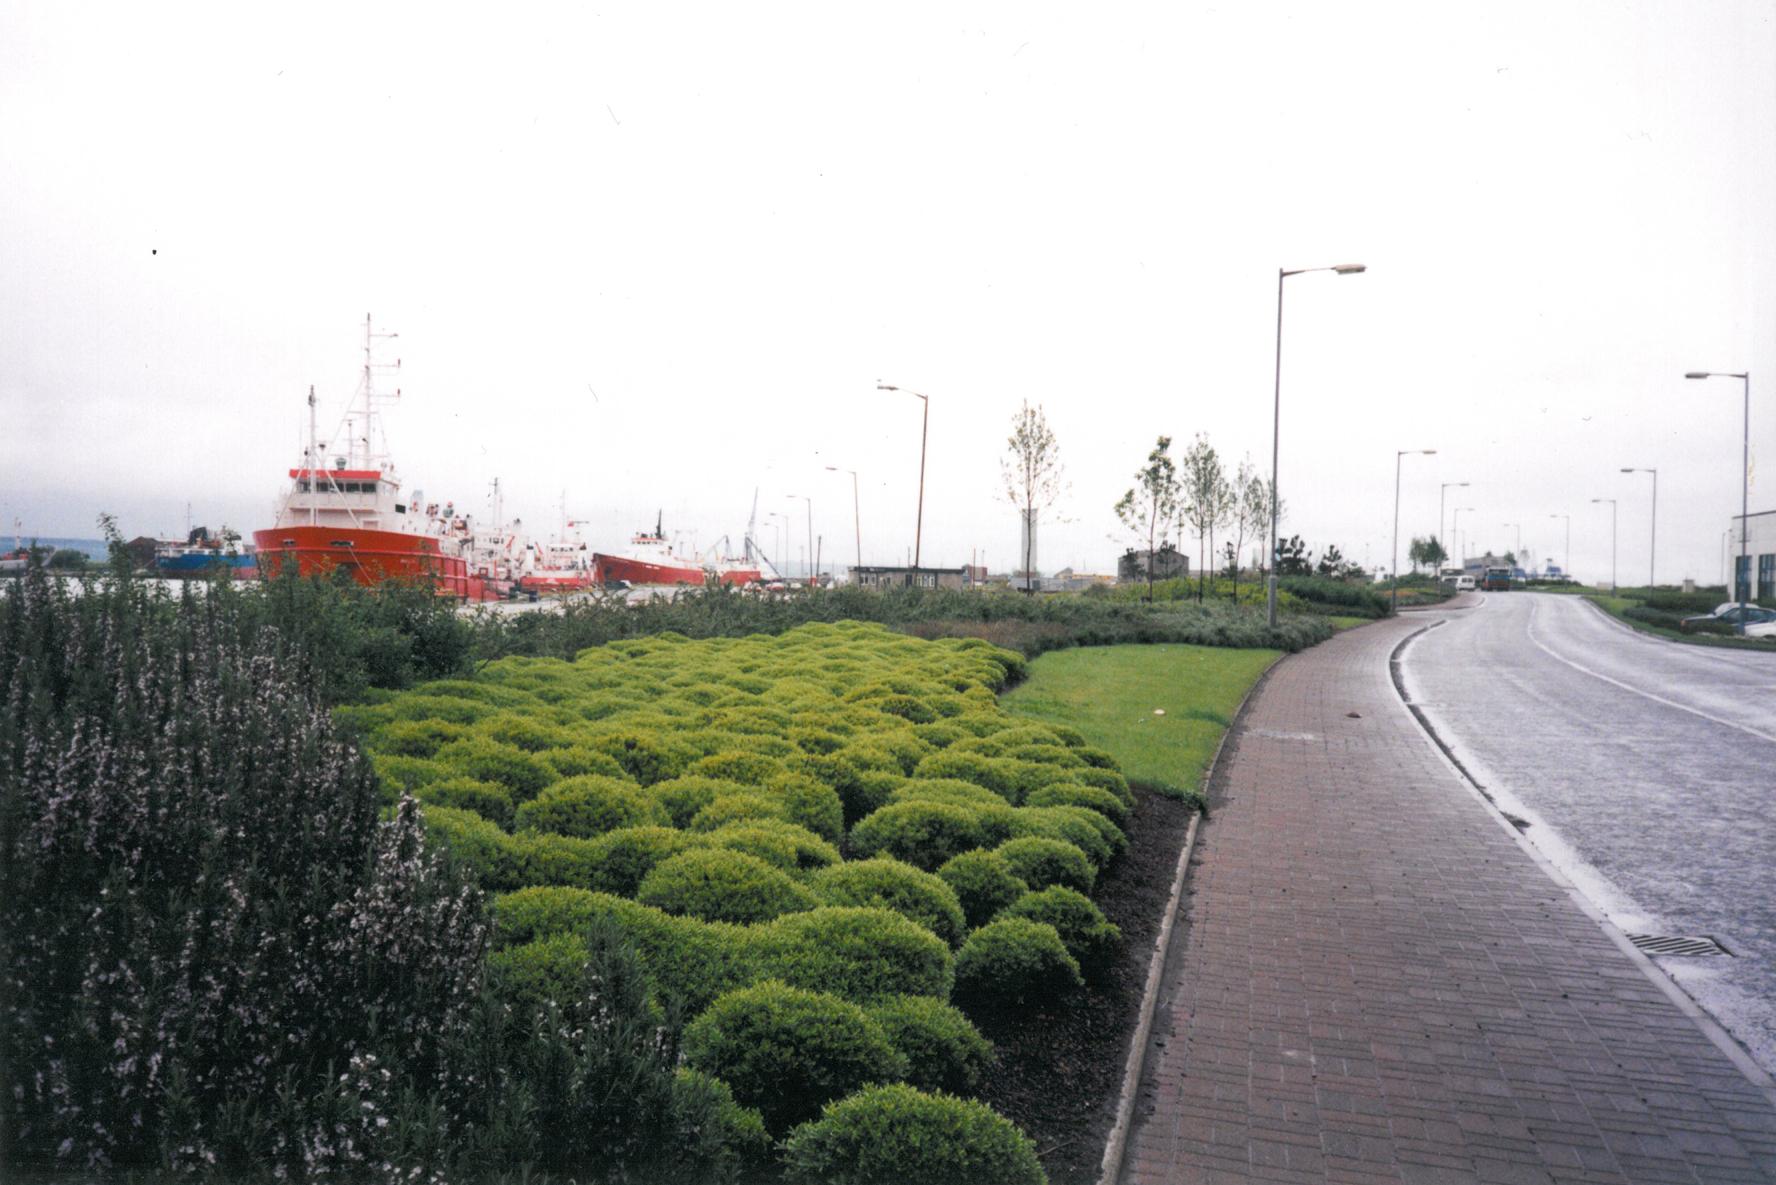 Baltic Quay Photo Scan 1 RFS.jpg